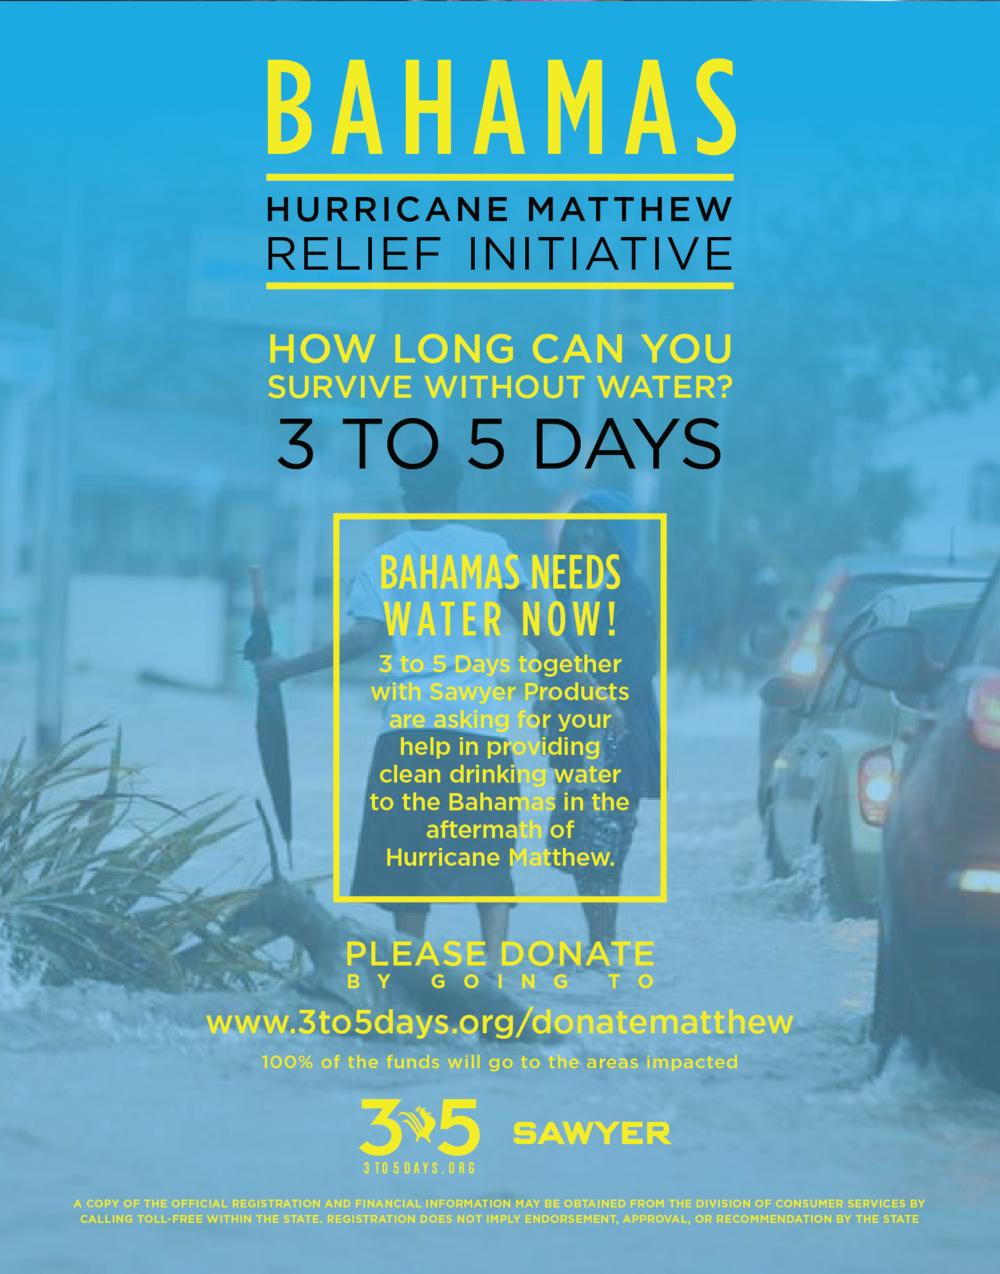 Bahamas 3 to 5 Days